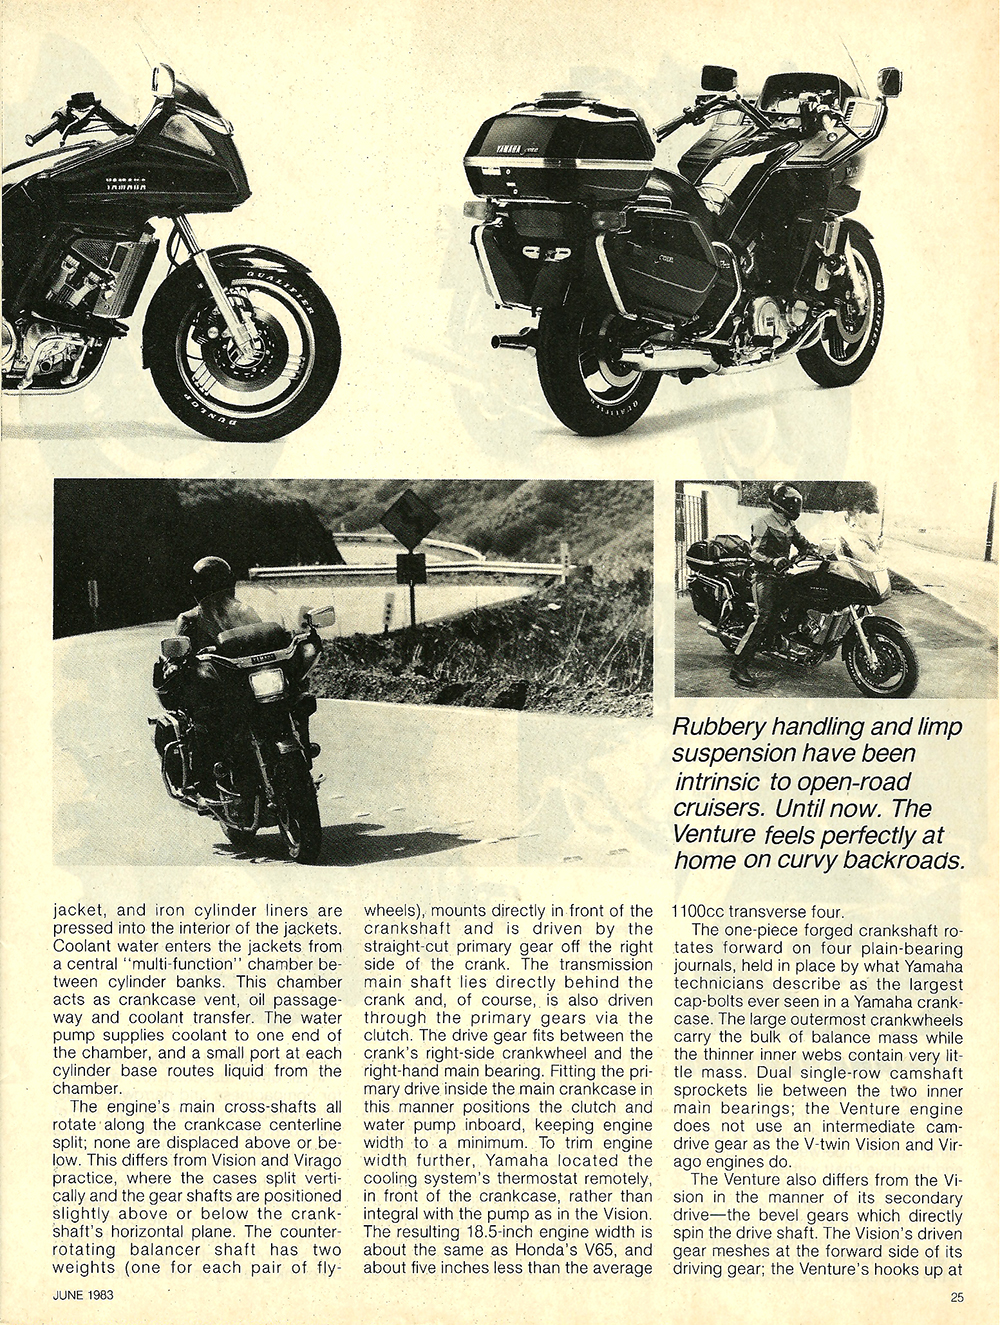 1983 Yamaha XVZ12TK Venture road test 04.jpg